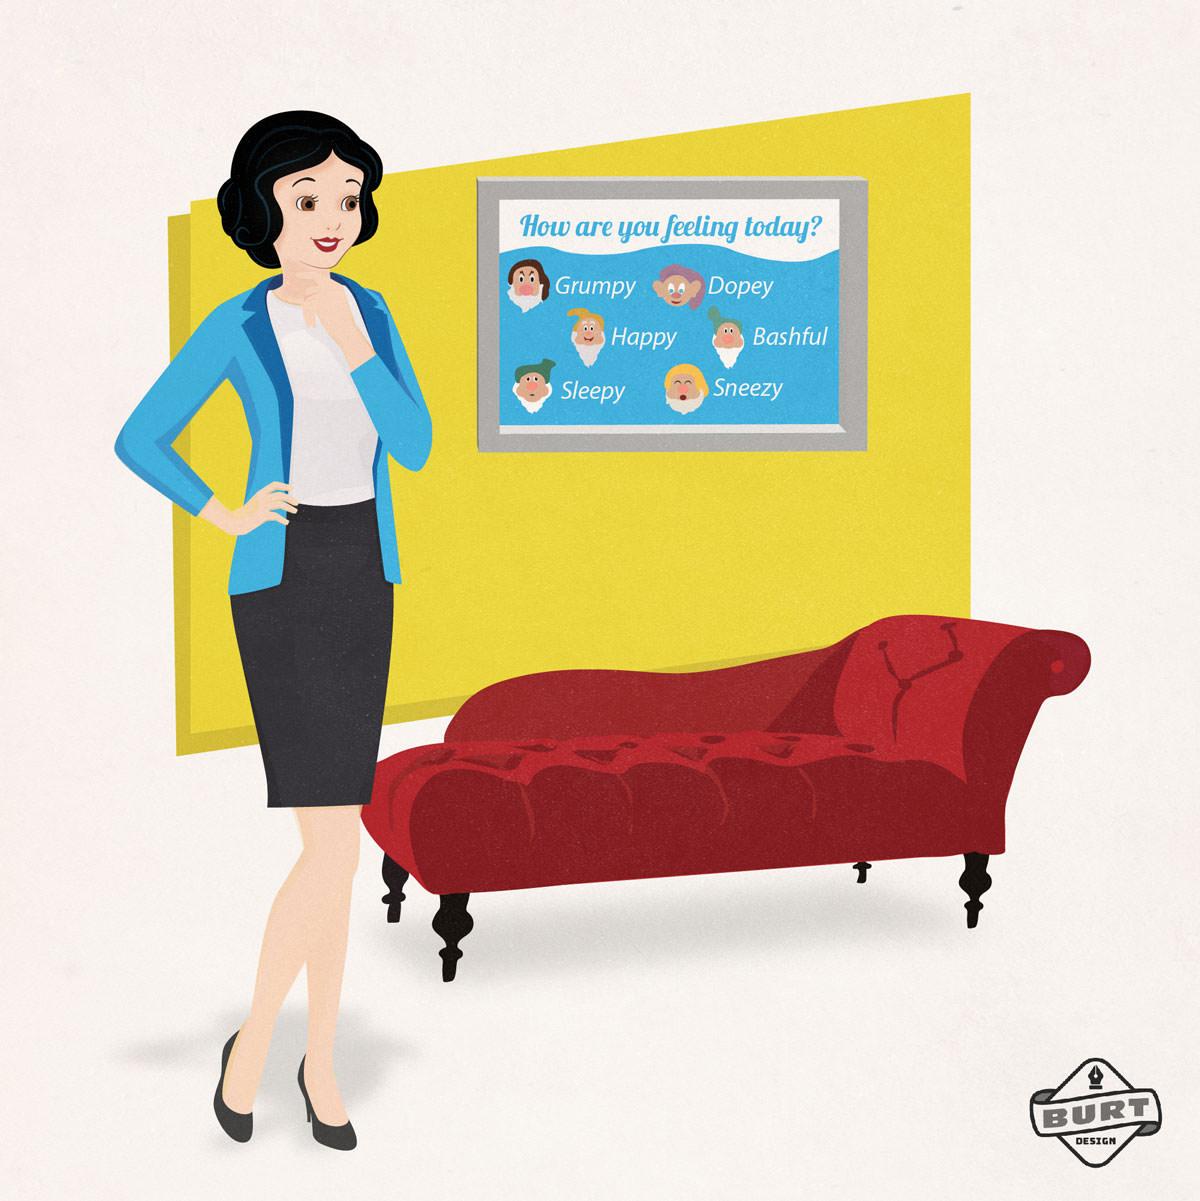 Disney Princess Snow White psychotherapist role model